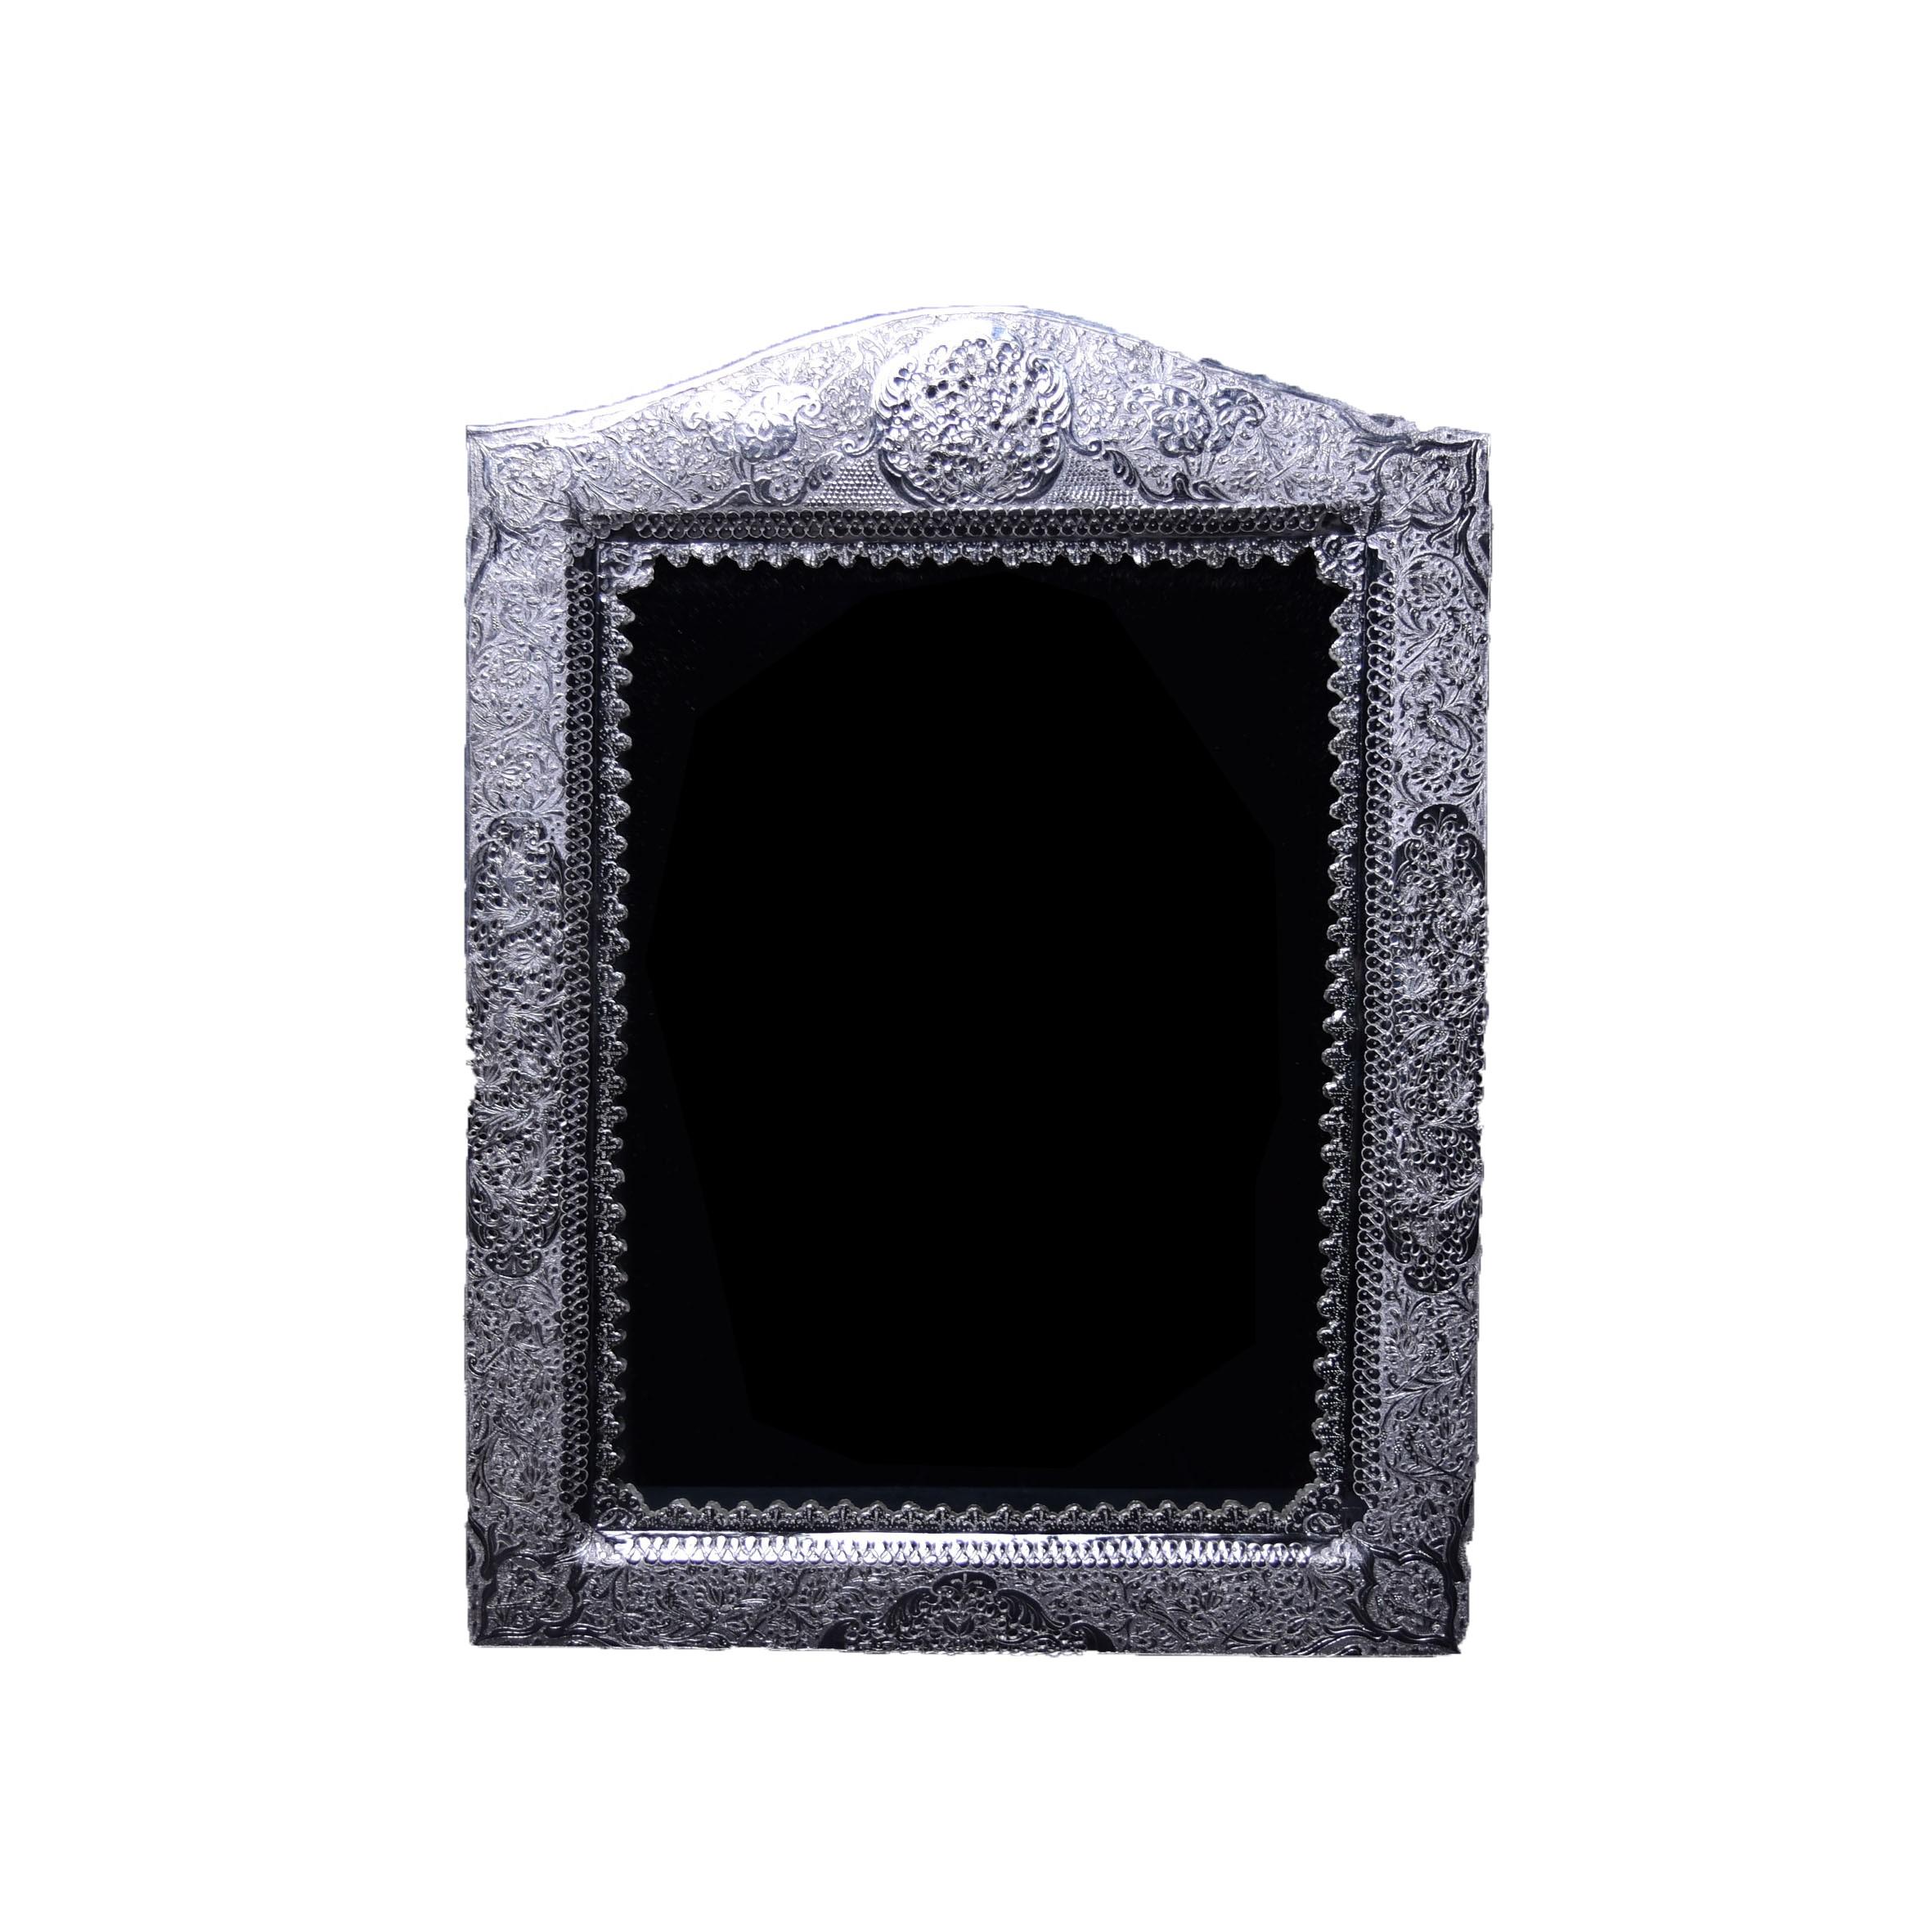 آینه تاج هلالی نقره اهتمام S141010069